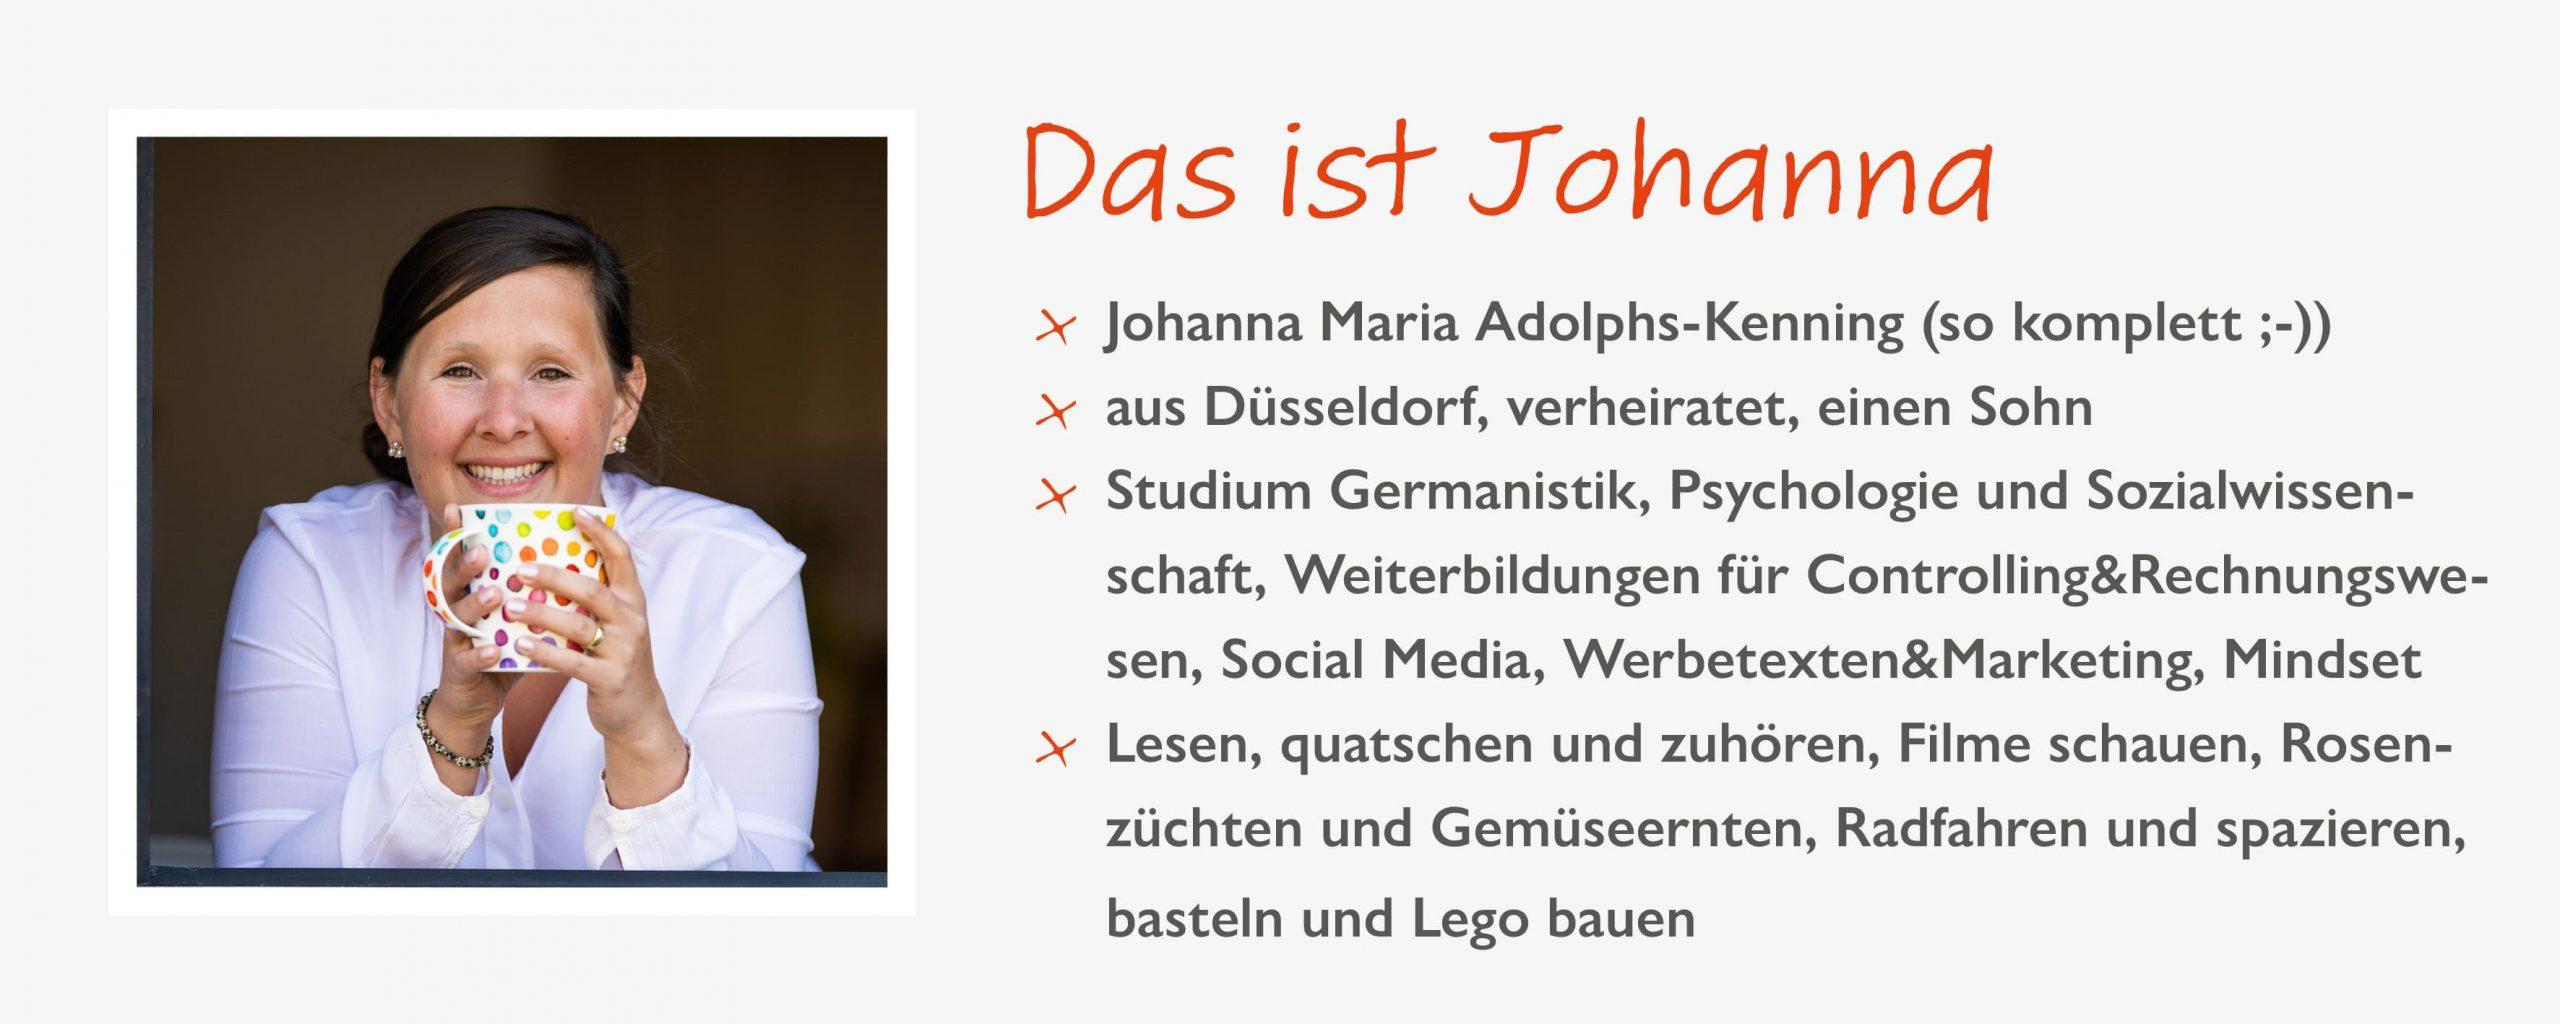 Steckbrief Johanna Adolphs-Kenning